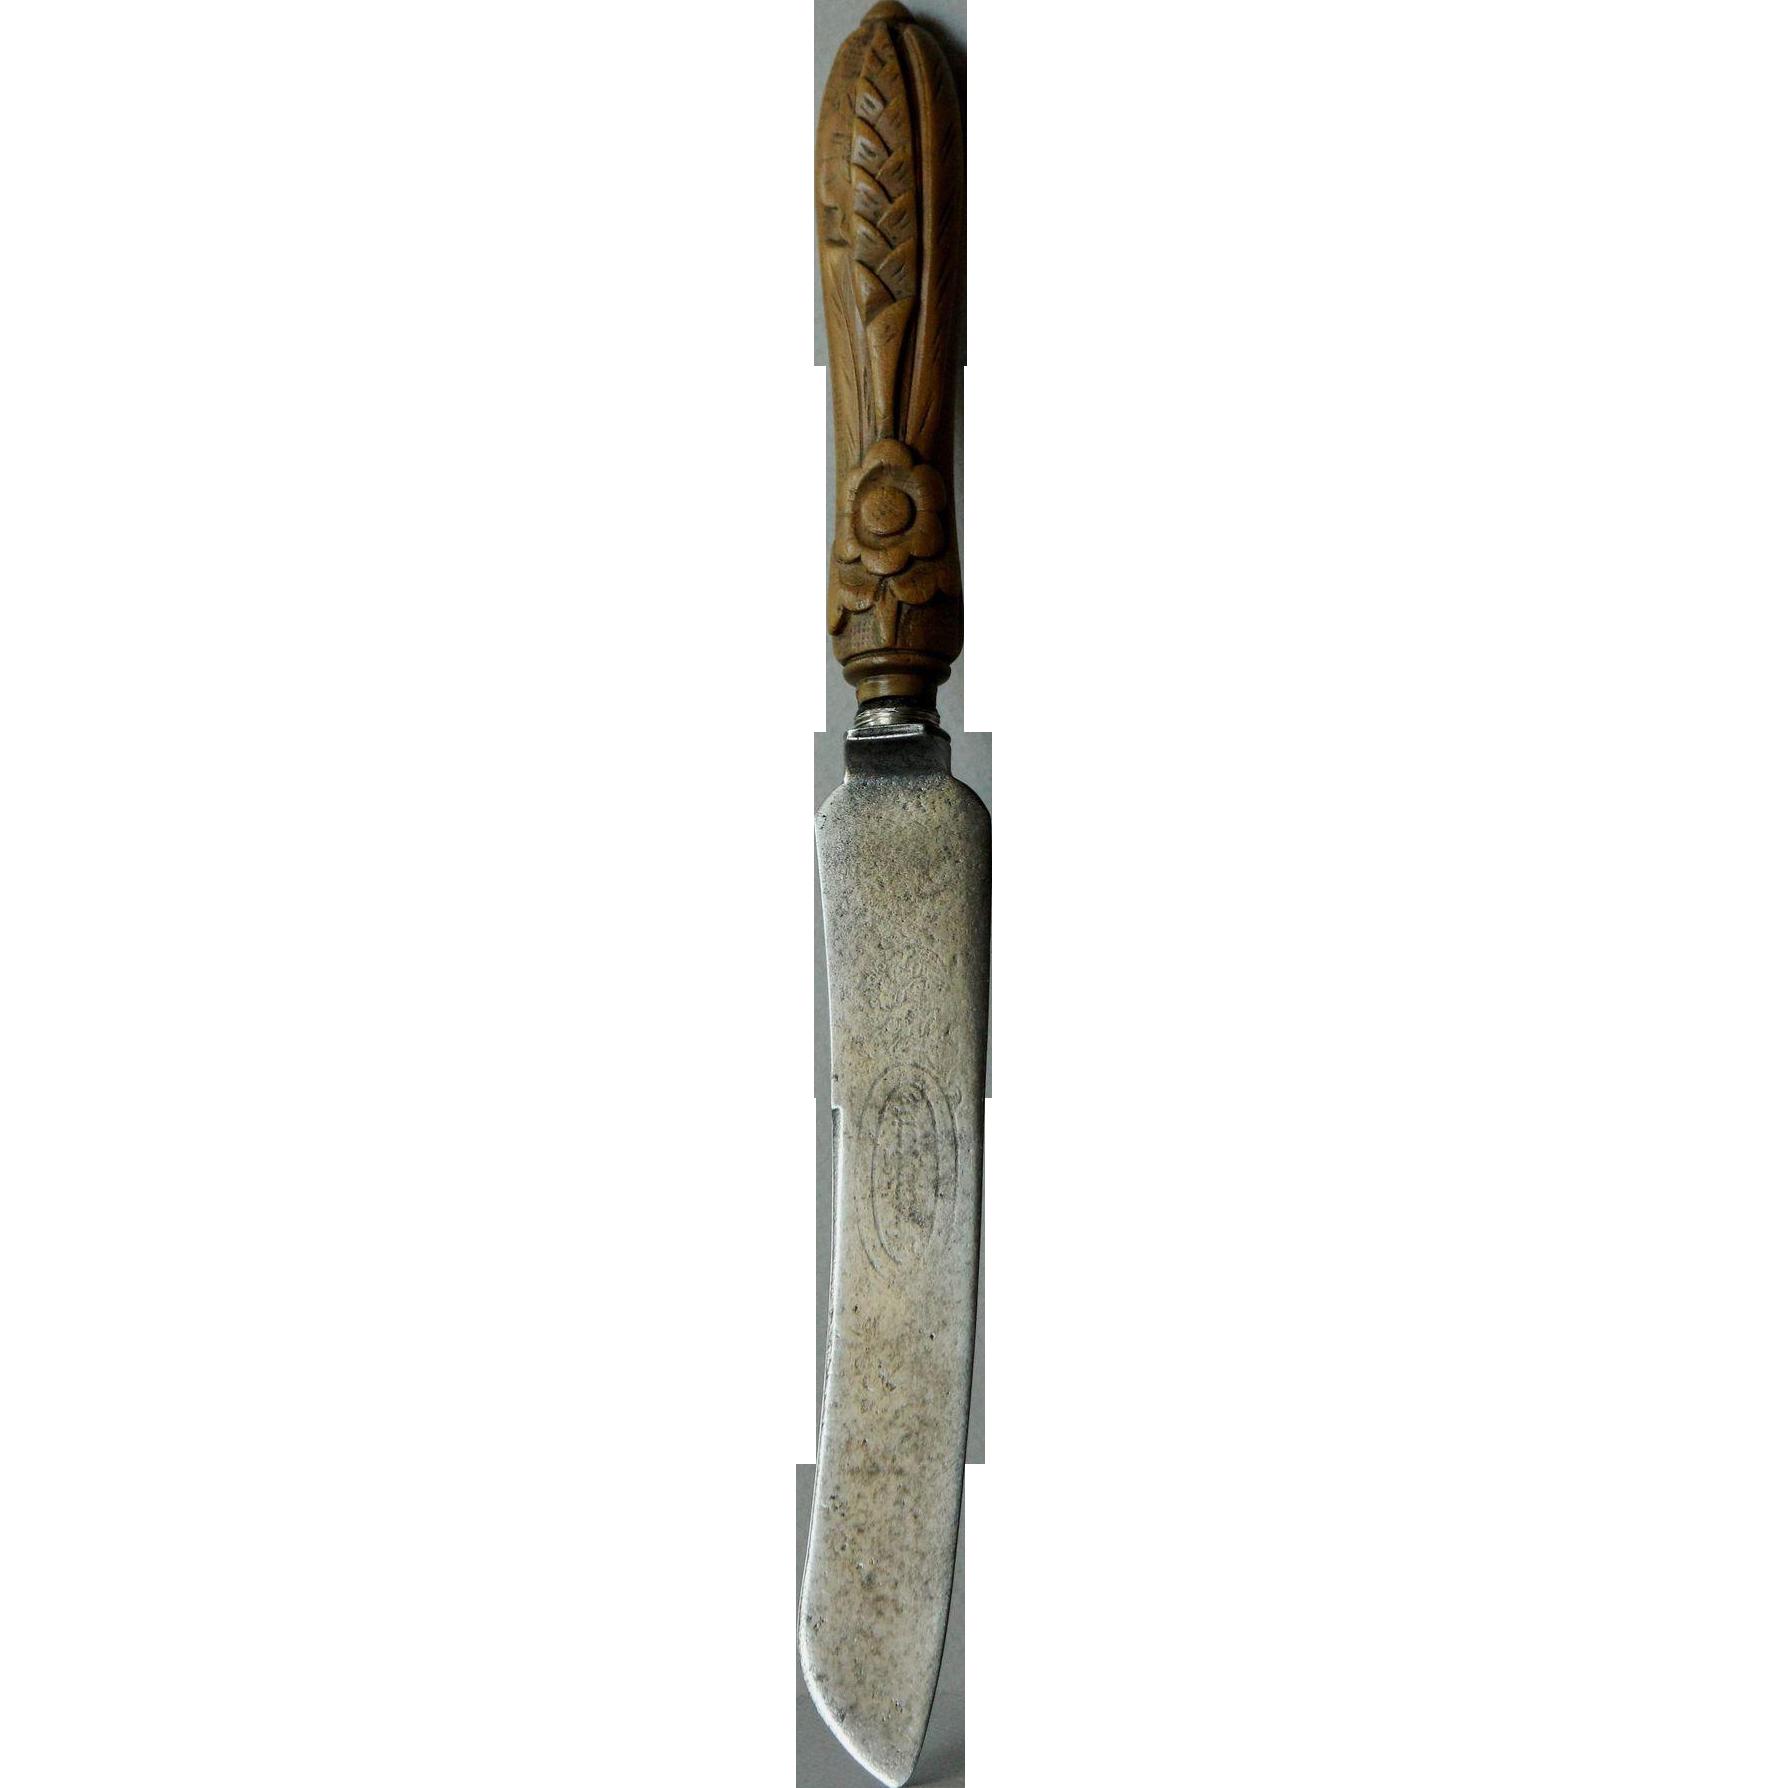 Antique English Bread Knife - 19th Century Victorian Breadknife